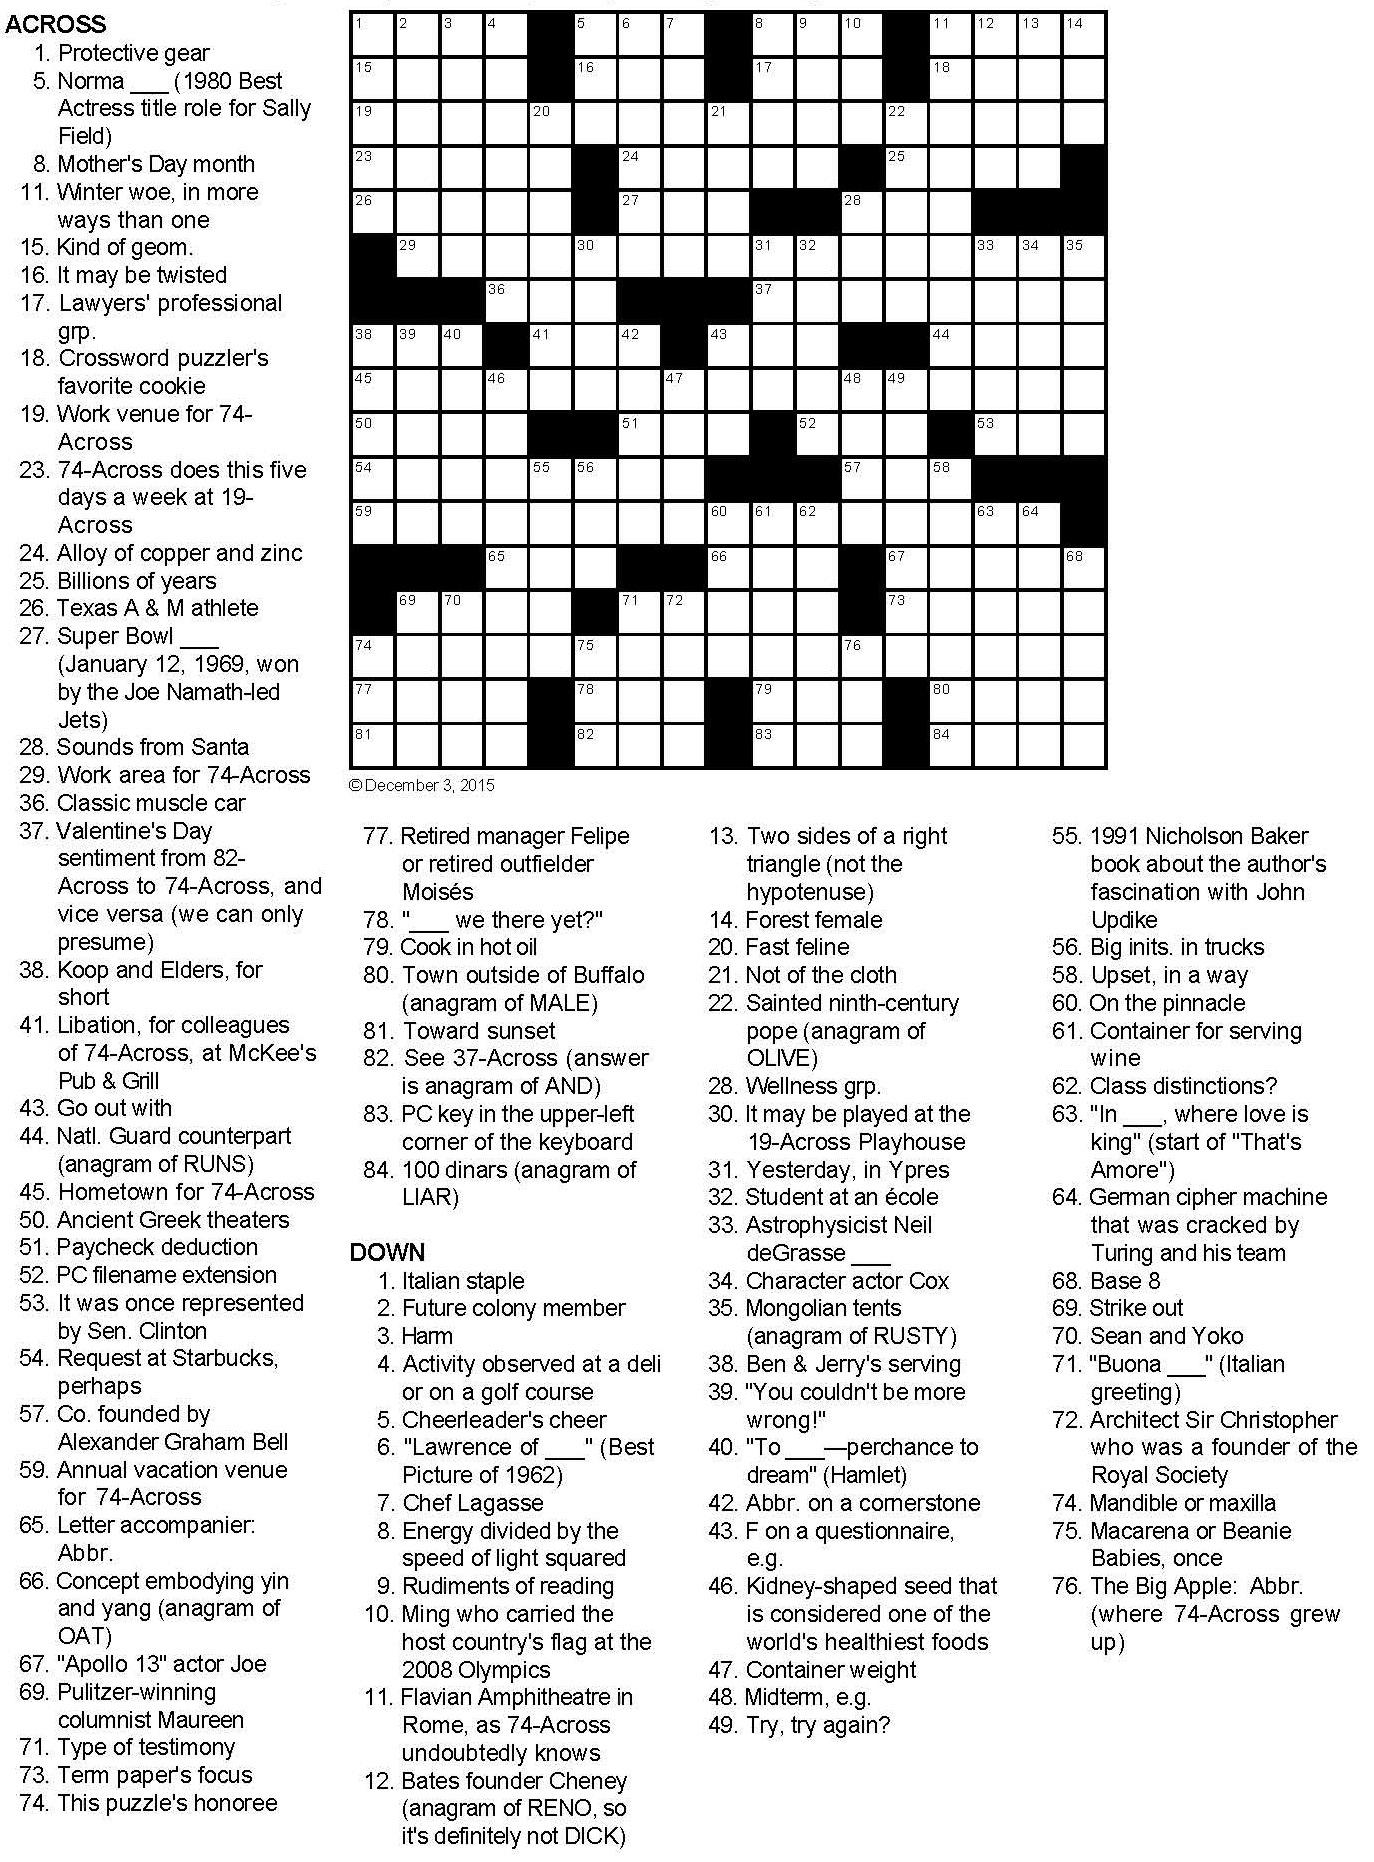 Not Your Garden-Variety Birthday Present Crossword Puzzle